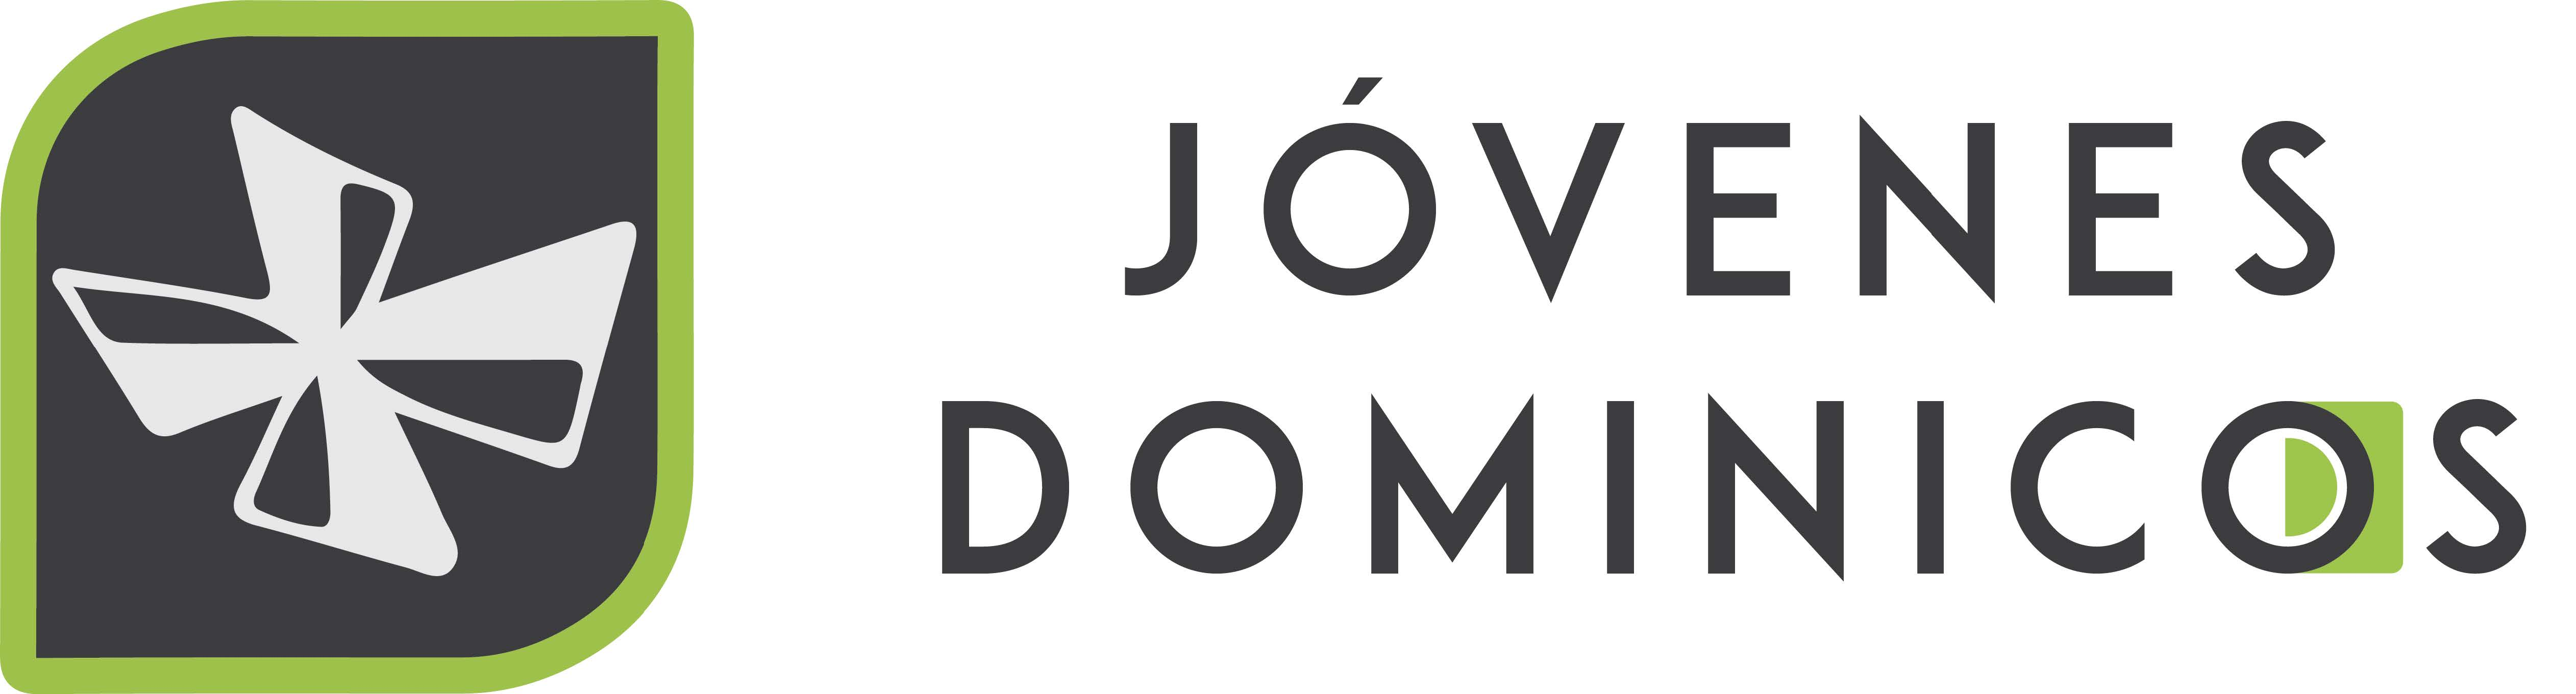 Jóvenes Dominic@s